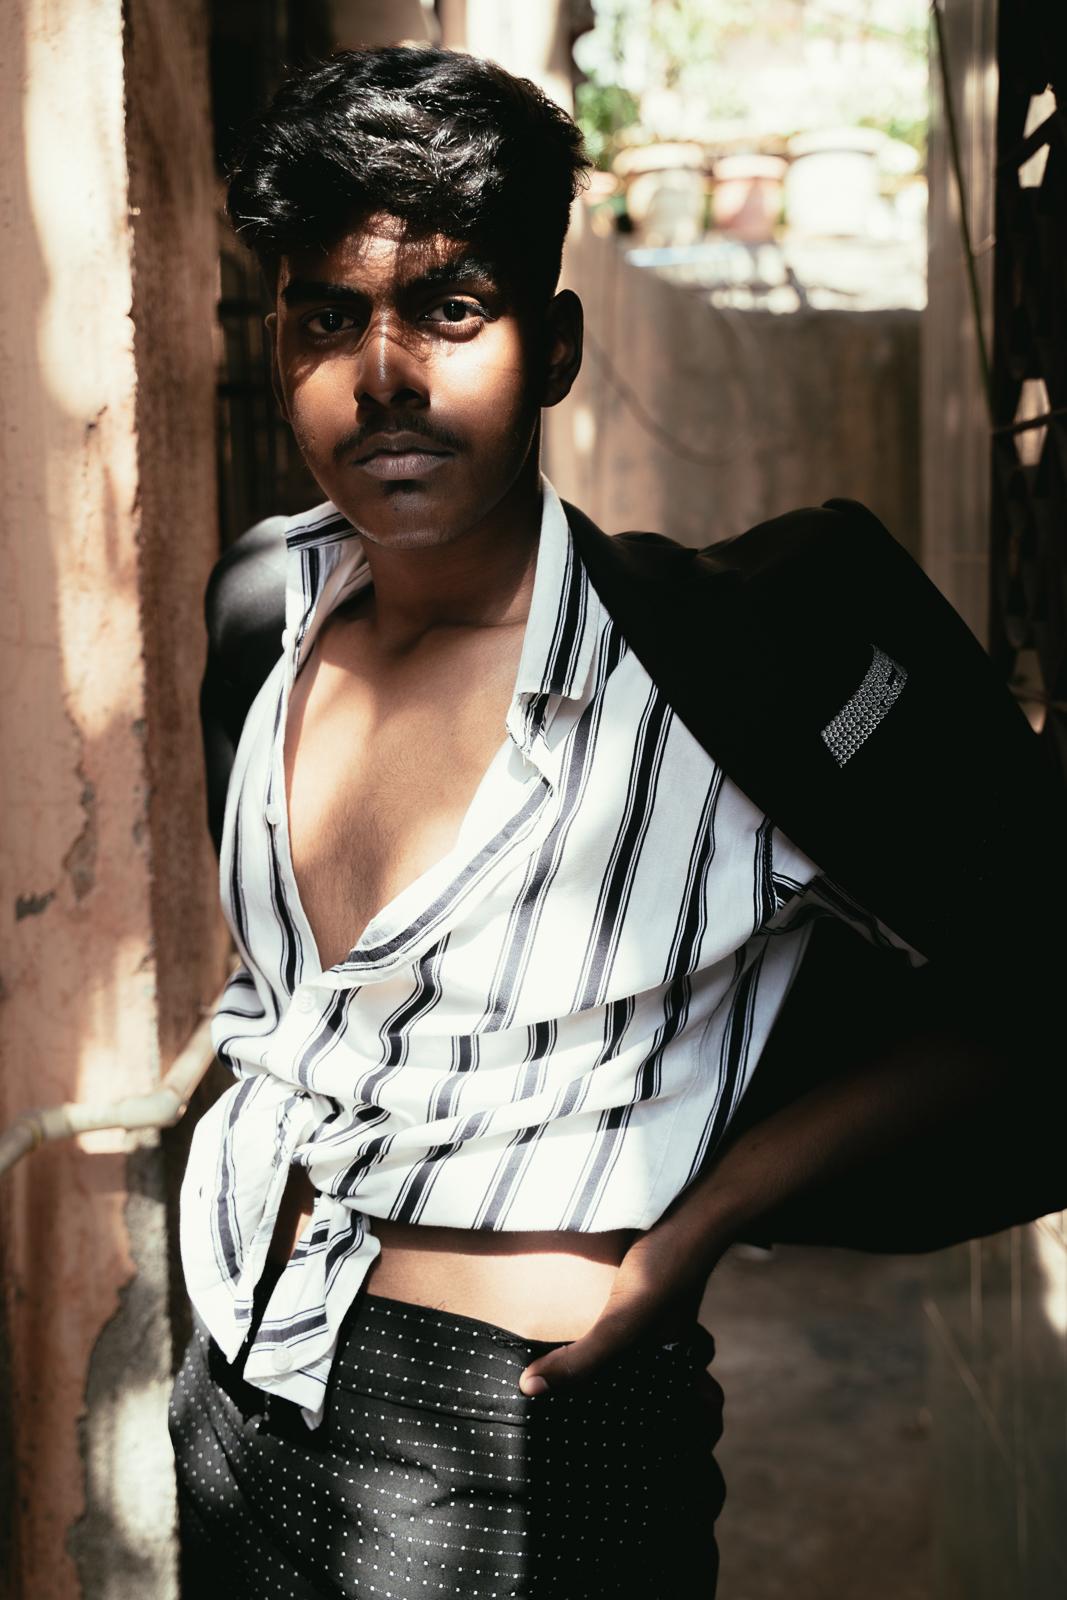 Queer_RebeccaRuetten_India_Yash_web-00606.jpg